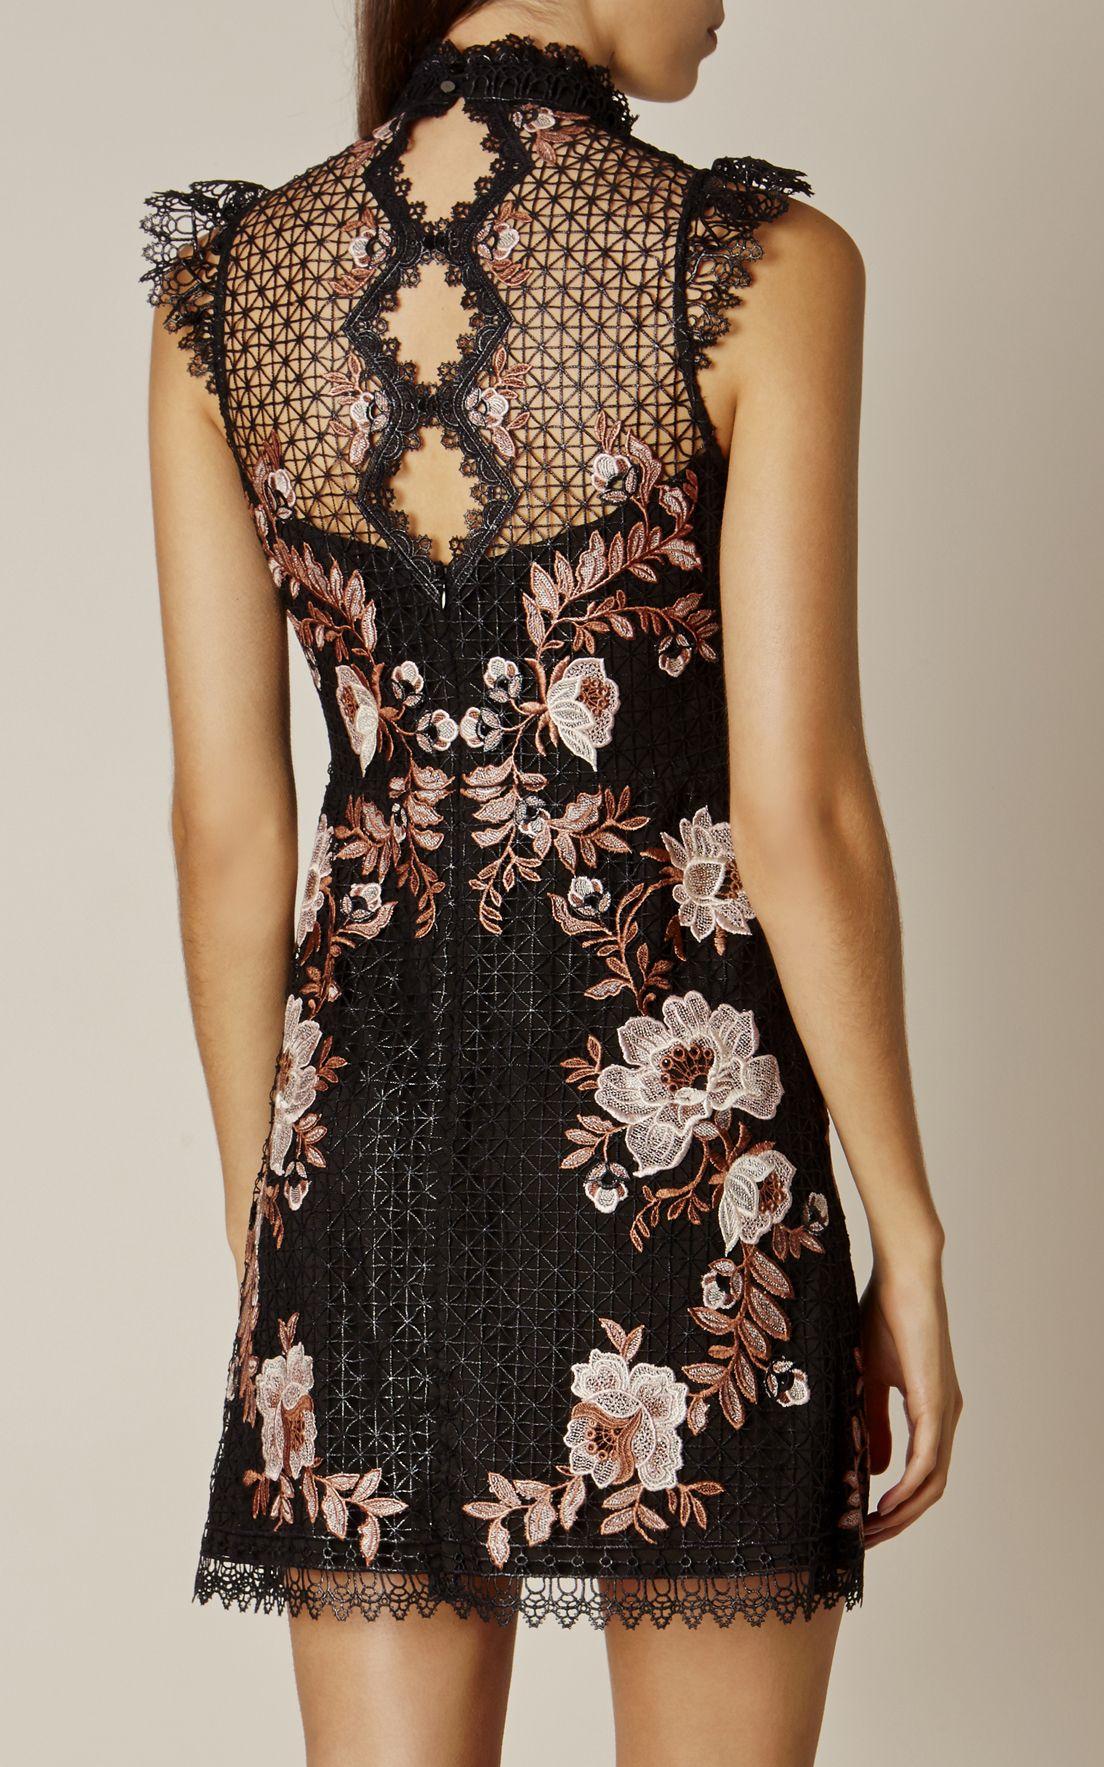 karen millen dresses | Karen Millen, LACE EMBROIDERED DRESS Black ...